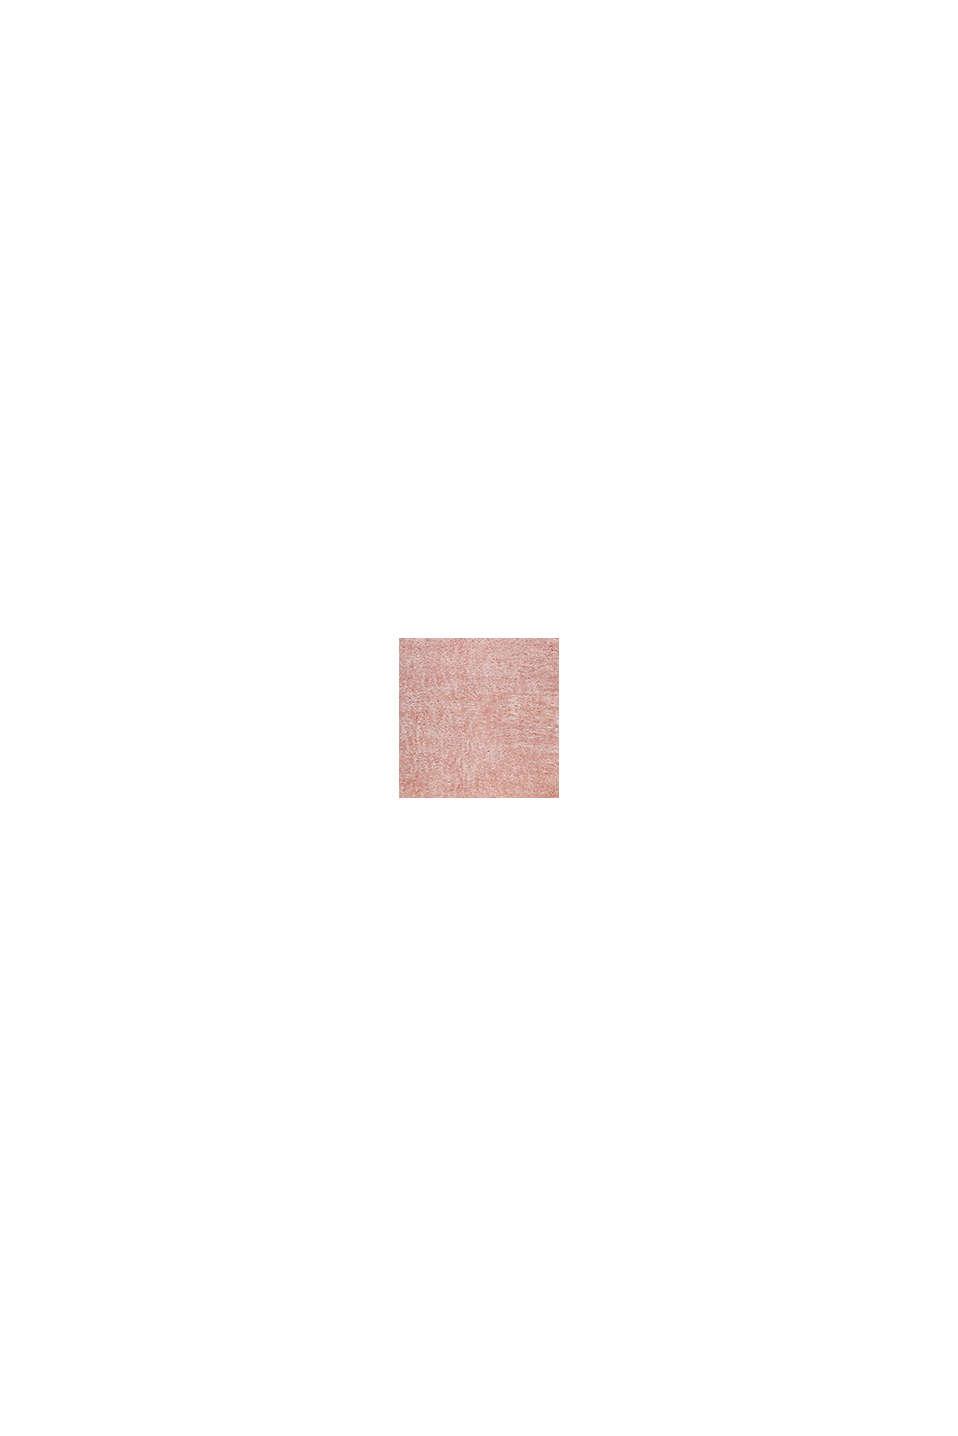 Flauschiger Langflor-Teppich, OLD PINK, swatch